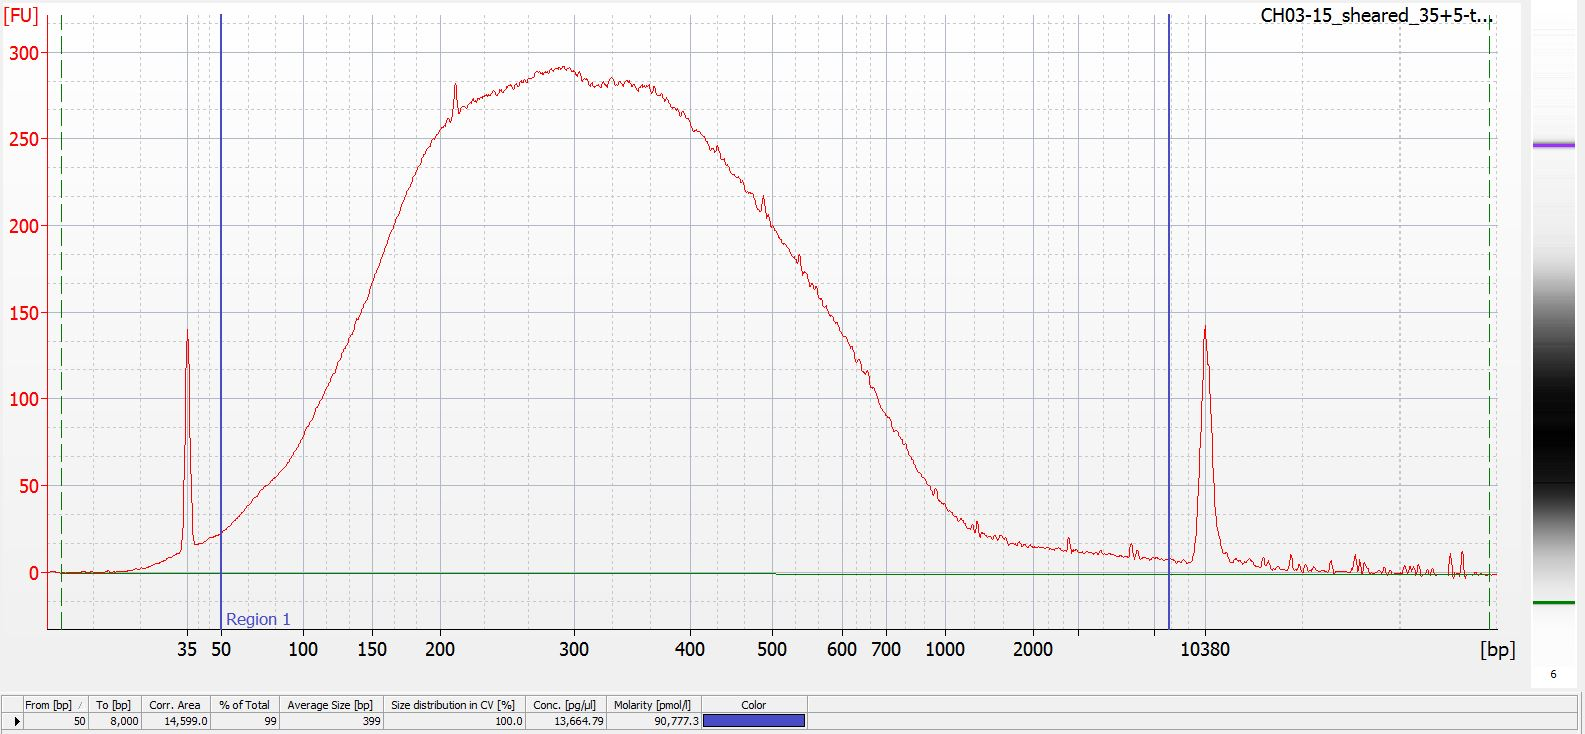 Sheared CH03-15 Bioanalyzer electropherogram